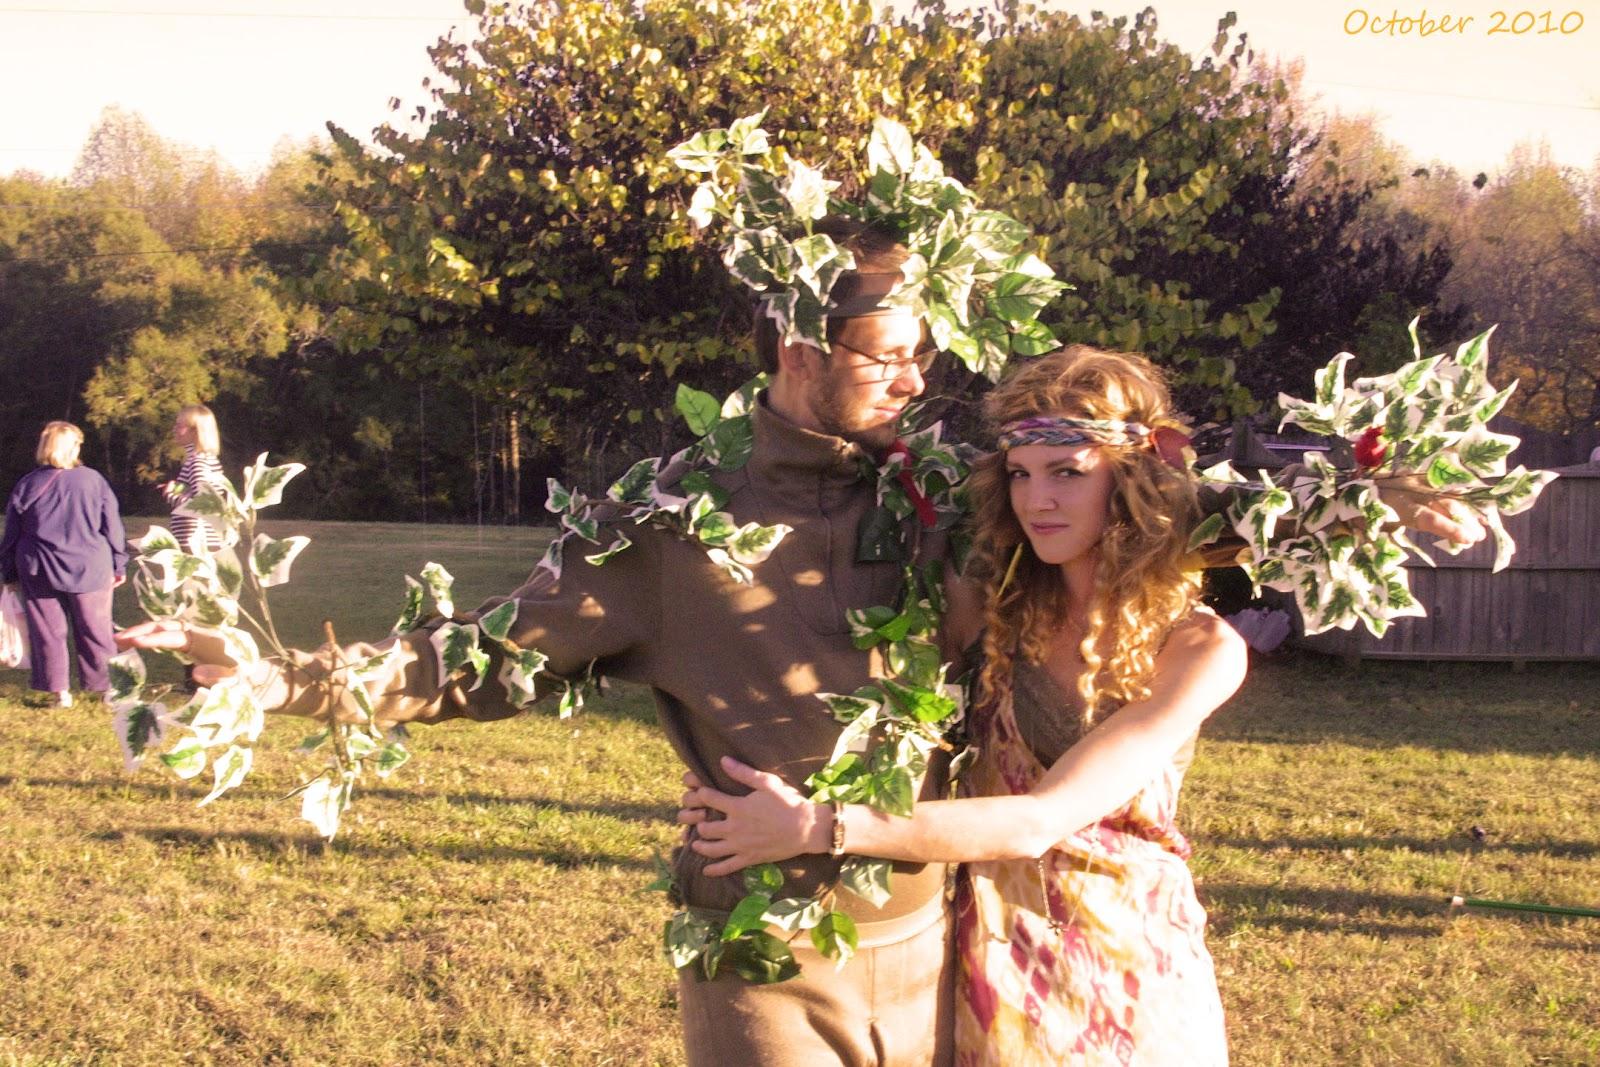 Source  sc 1 st  Outdoors Mom & OutdoorsMom: Tree u0026 Nature Themed Halloween Costume Ideas